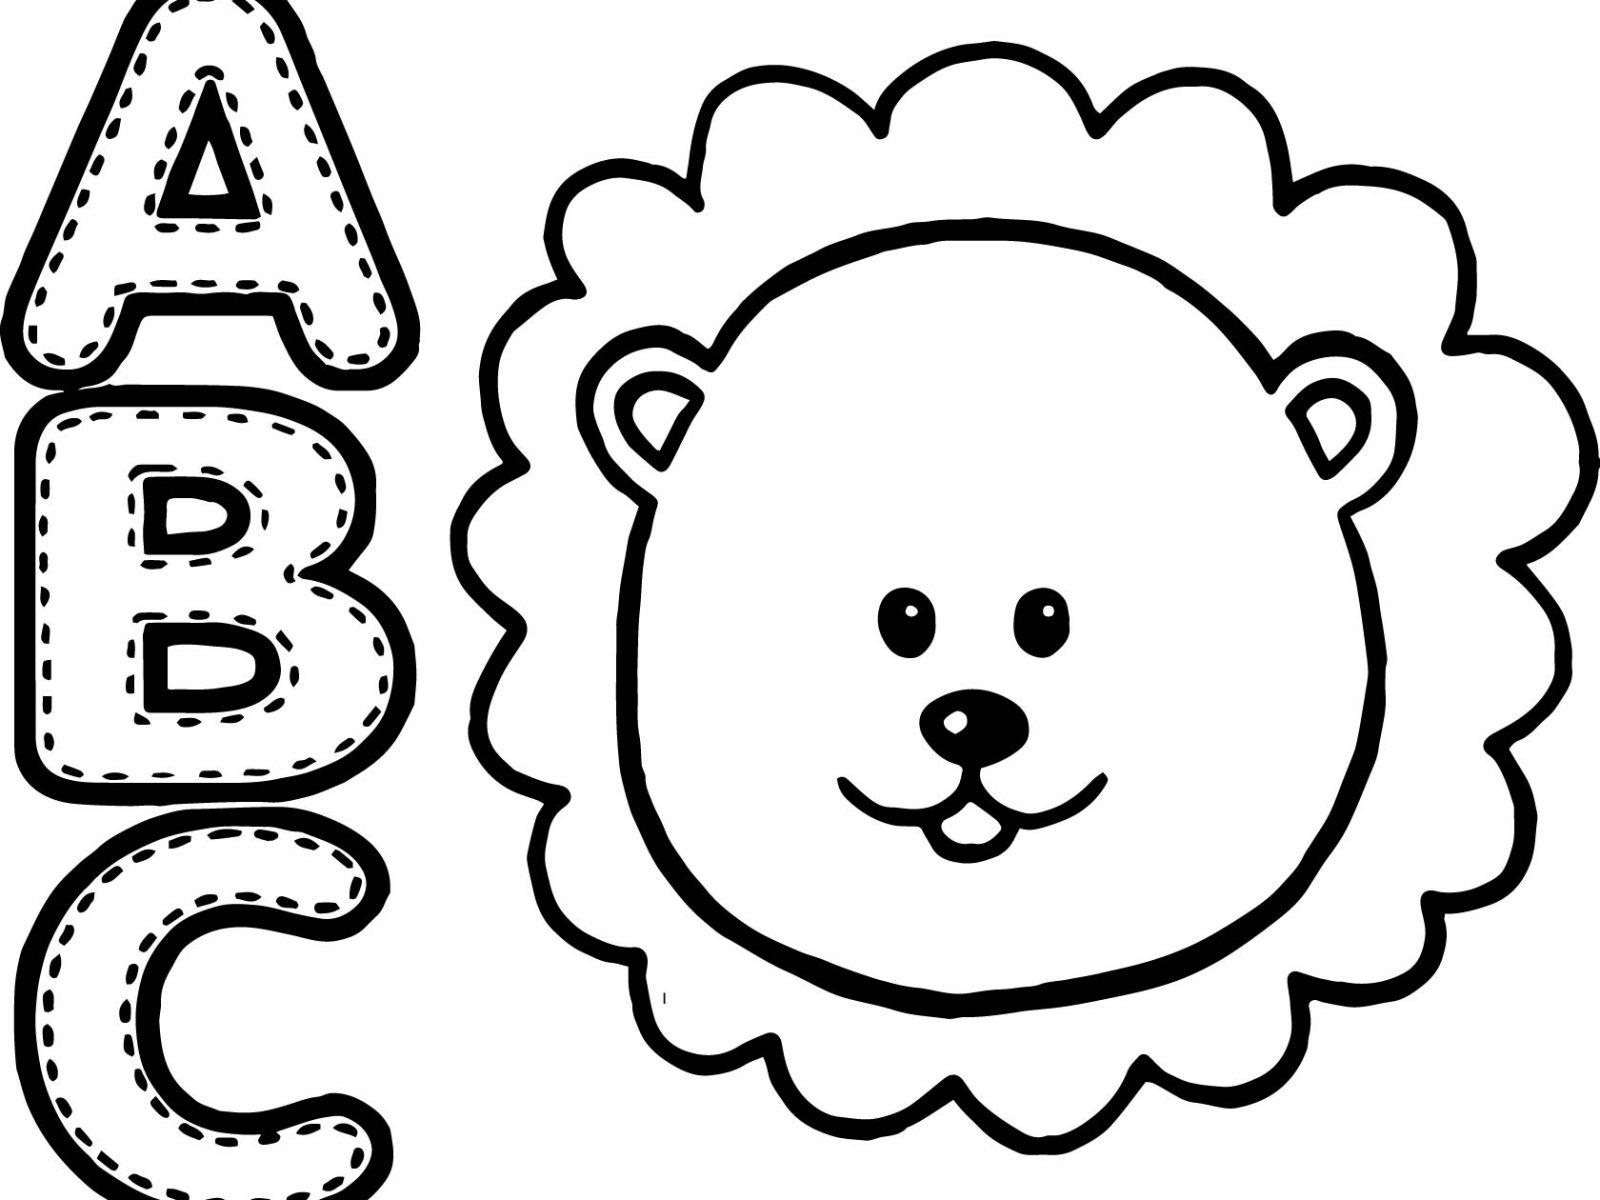 Animals Faces Drawing at GetDrawings